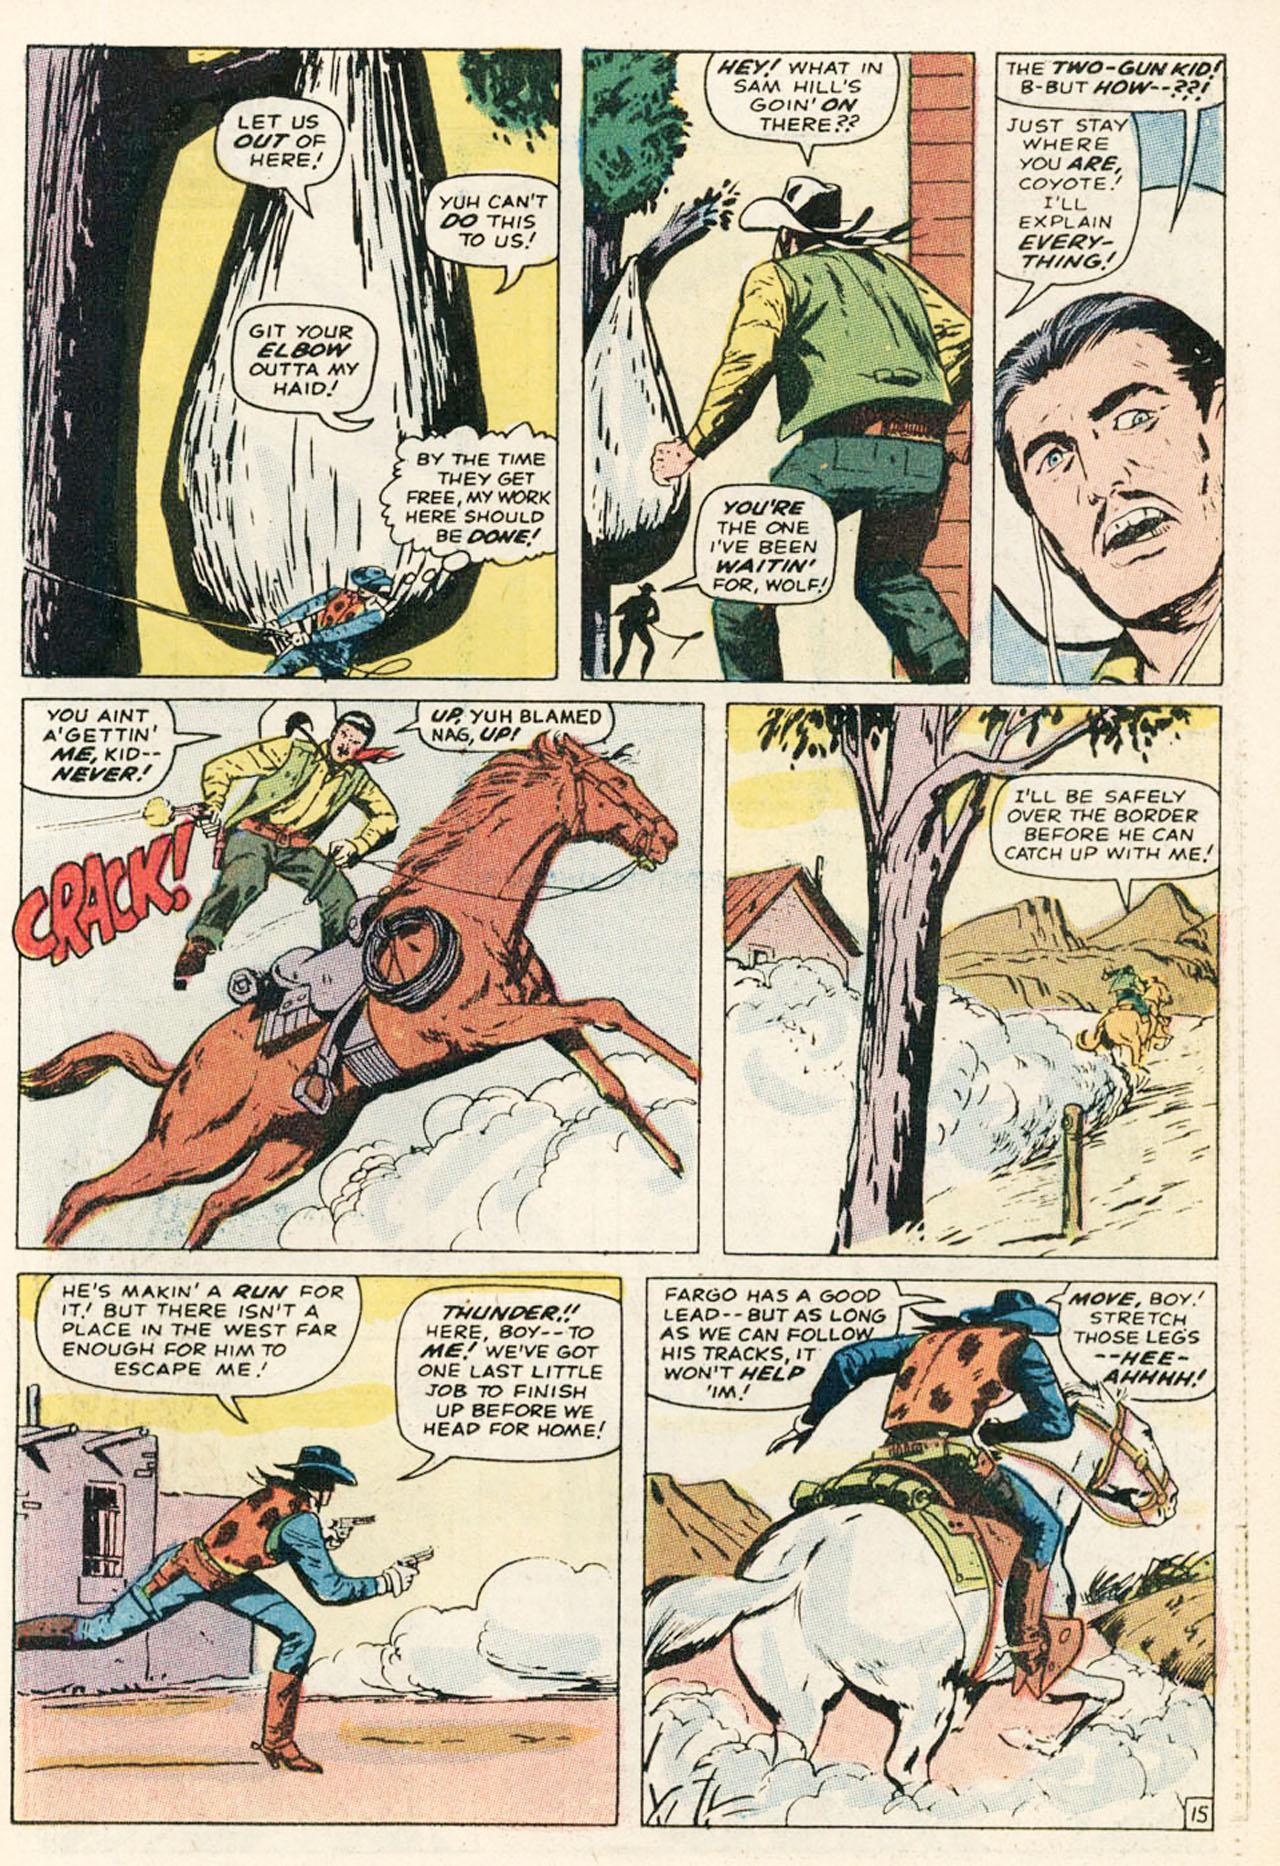 Read online Two-Gun Kid comic -  Issue #95 - 23